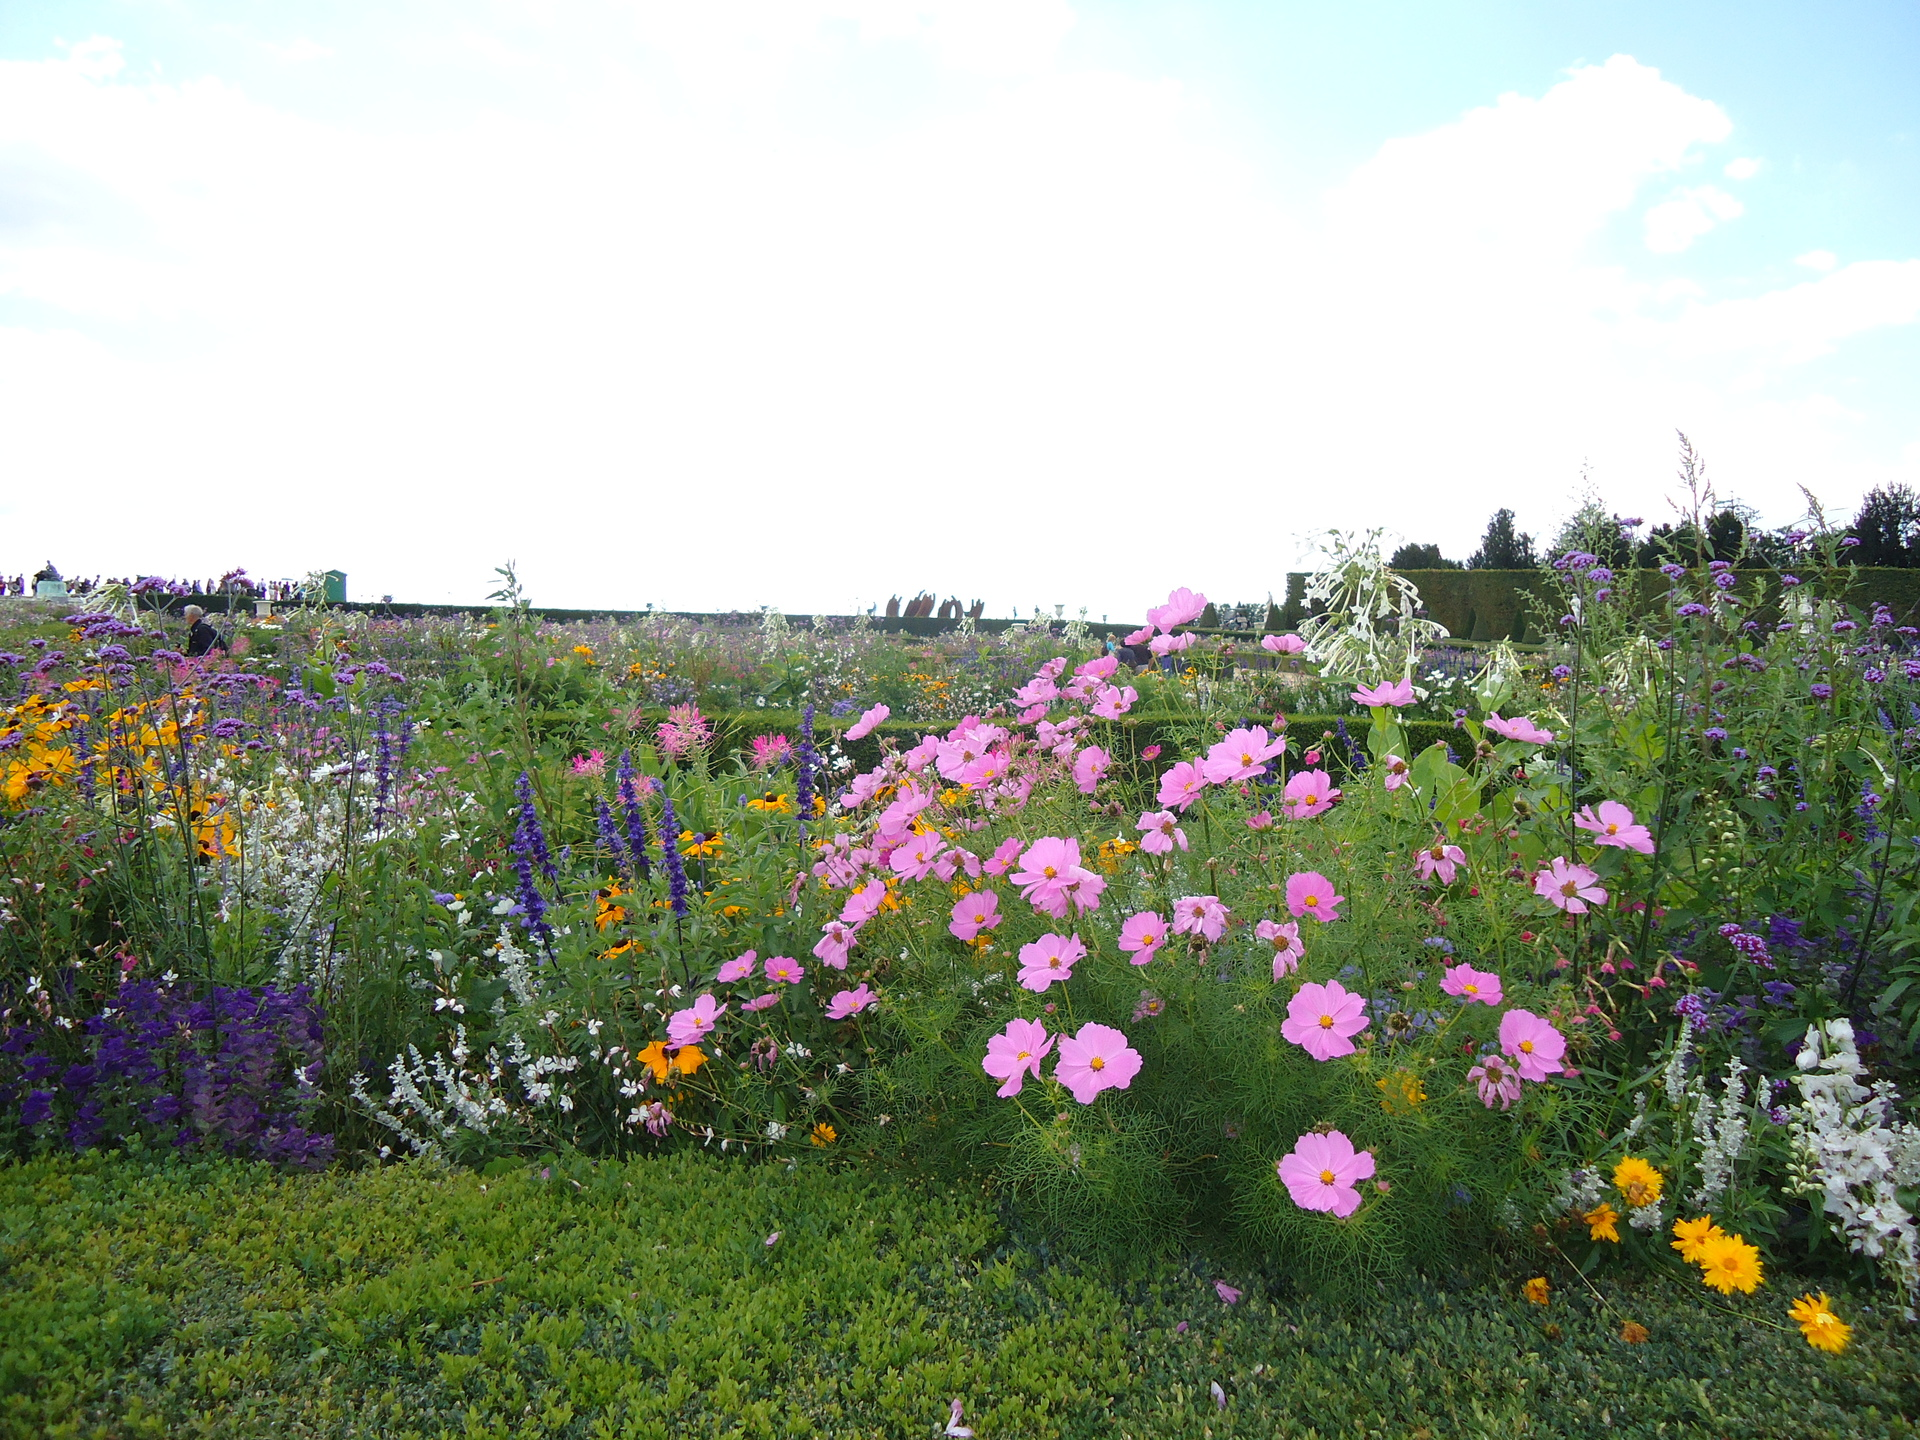 Flower | bashir.tabibi, flower, landscape, nature